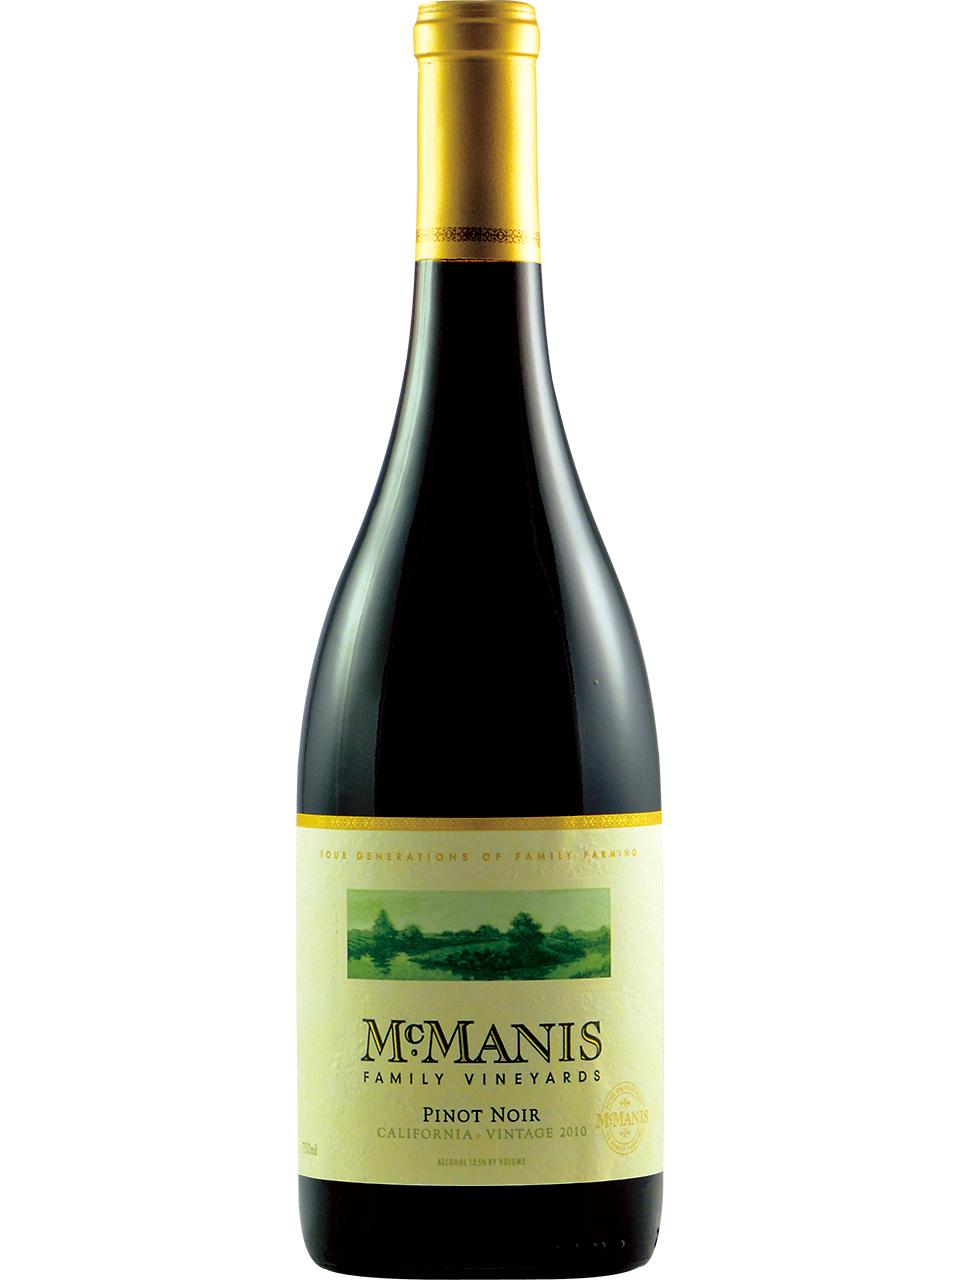 McManis Family Vineyards Pinot Noir